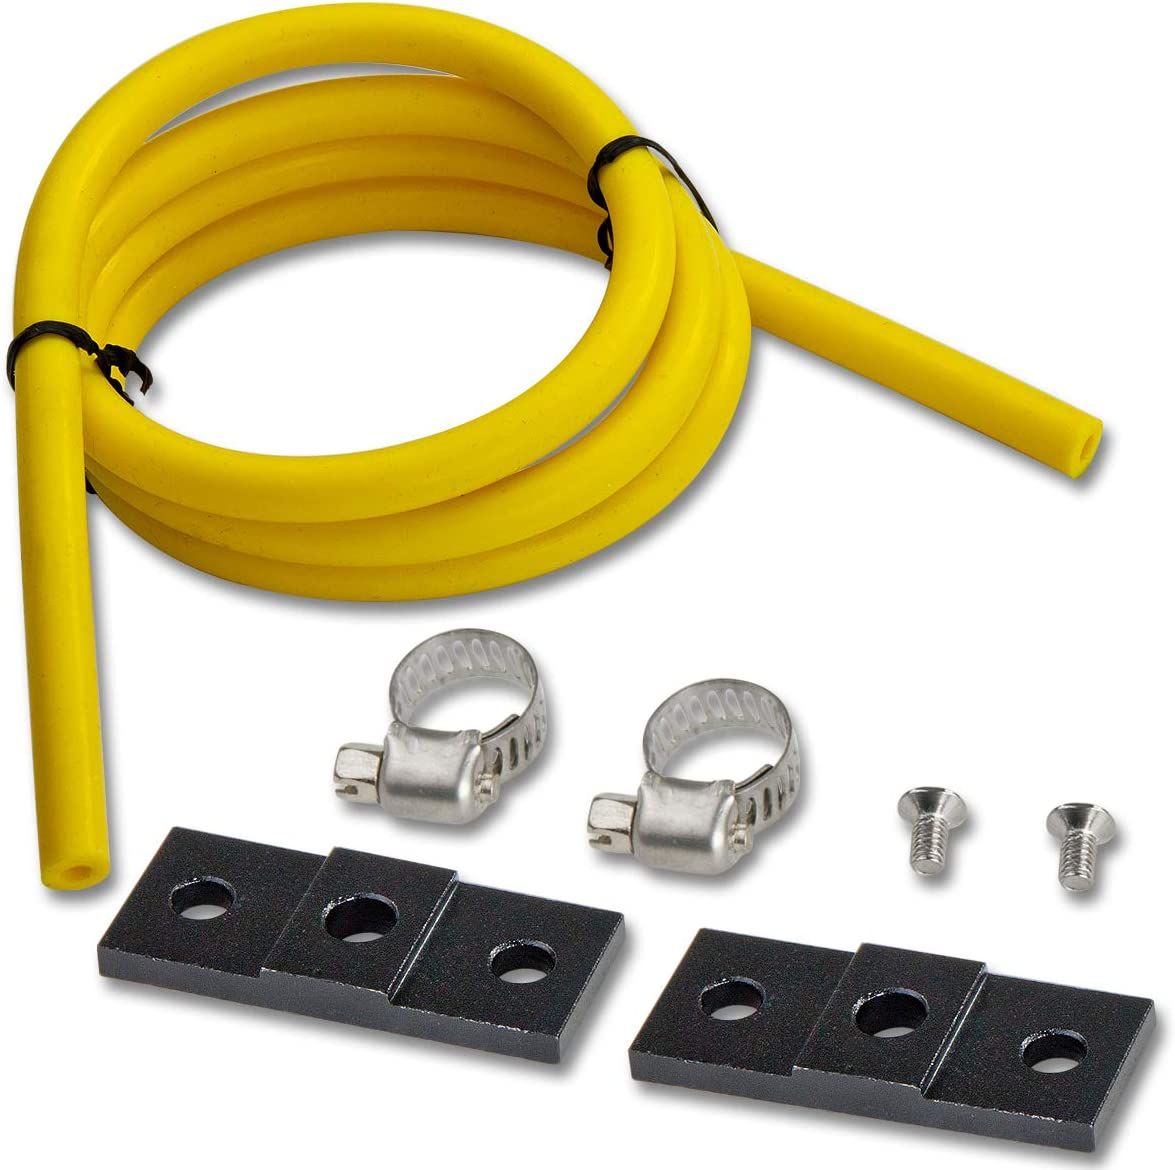 Silver Universal Adjustable 30PSI Manual Turbo Boost Controller Kit